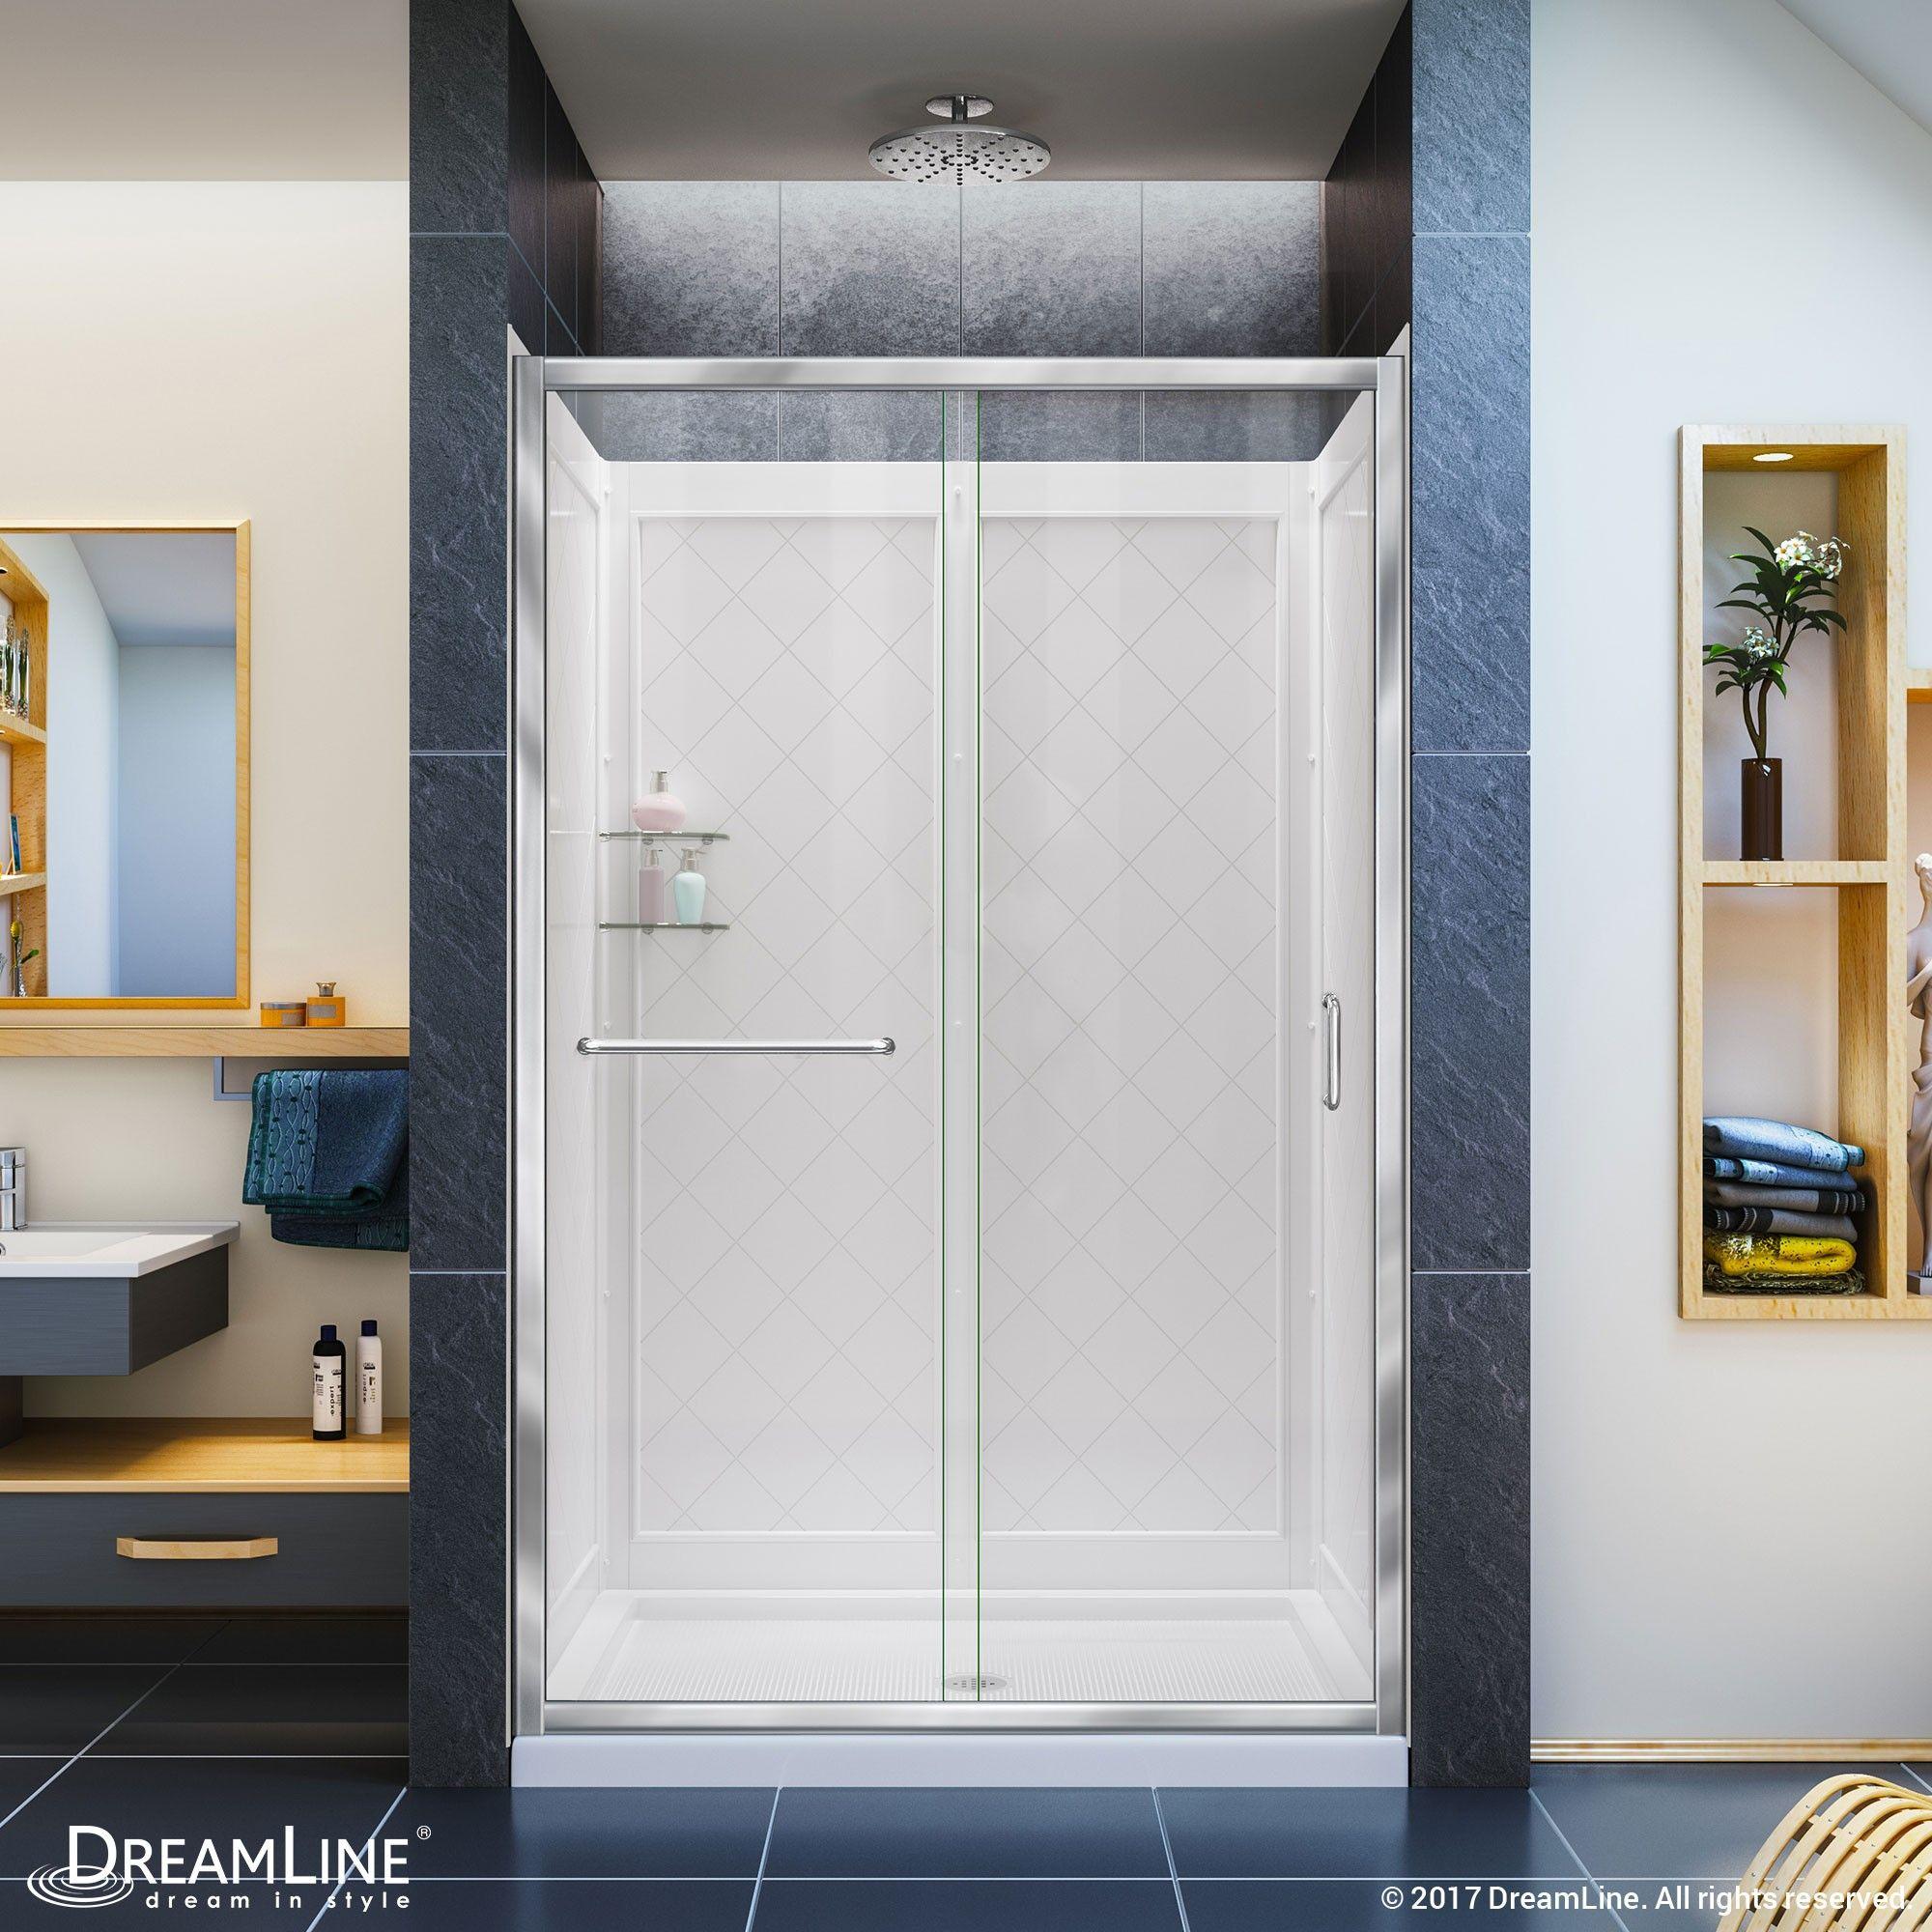 The Dreamline Infinity Z Sliding Shower Door Offers Classic